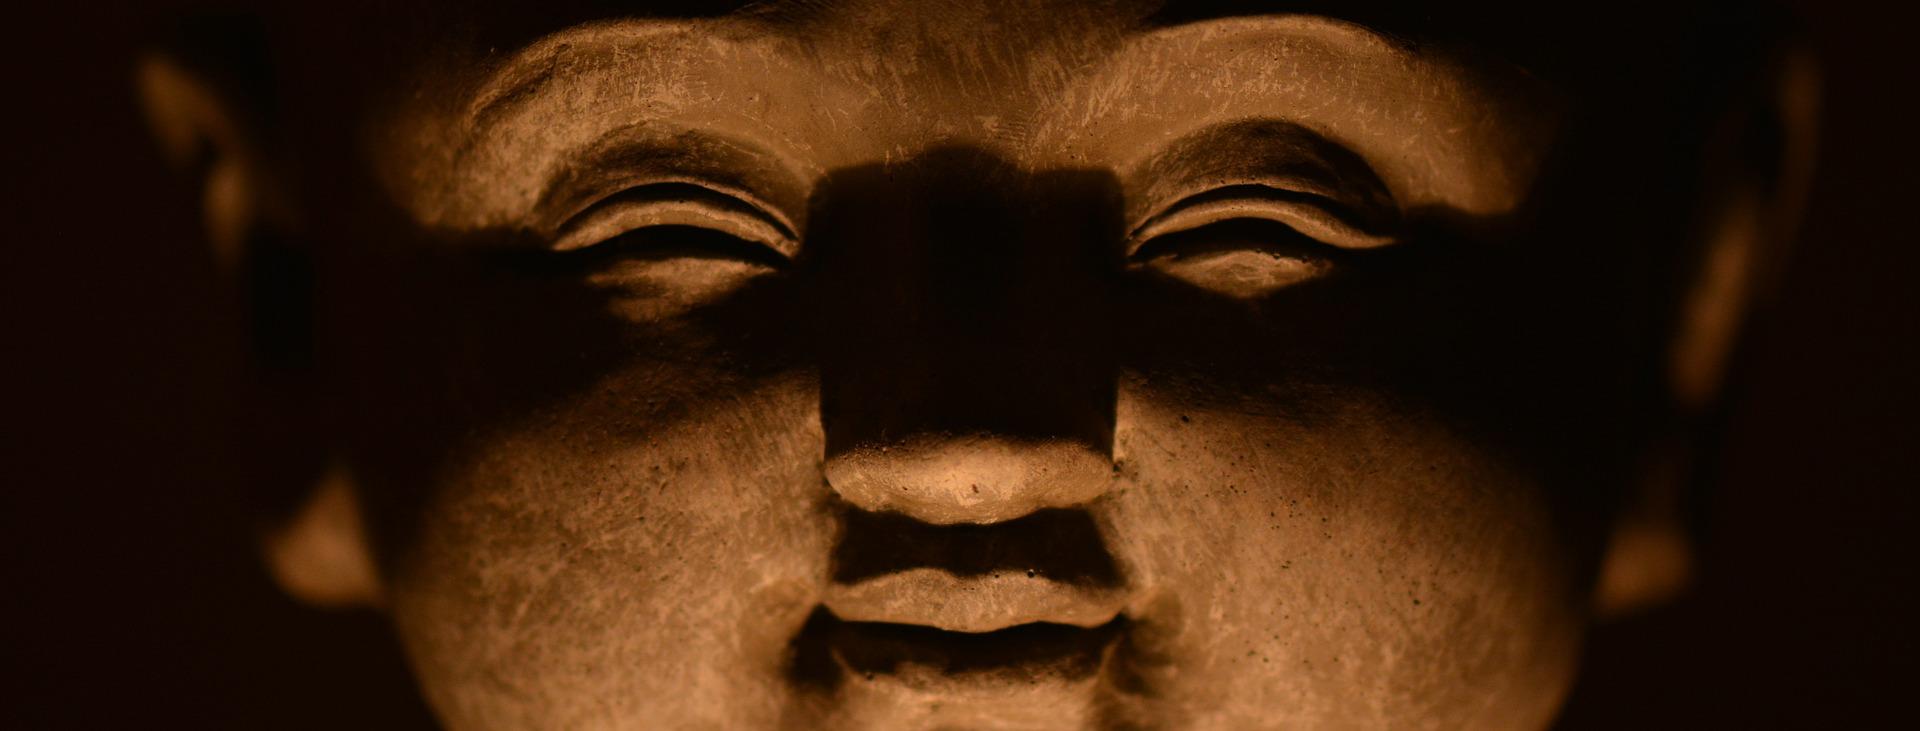 buddha-513712_1920